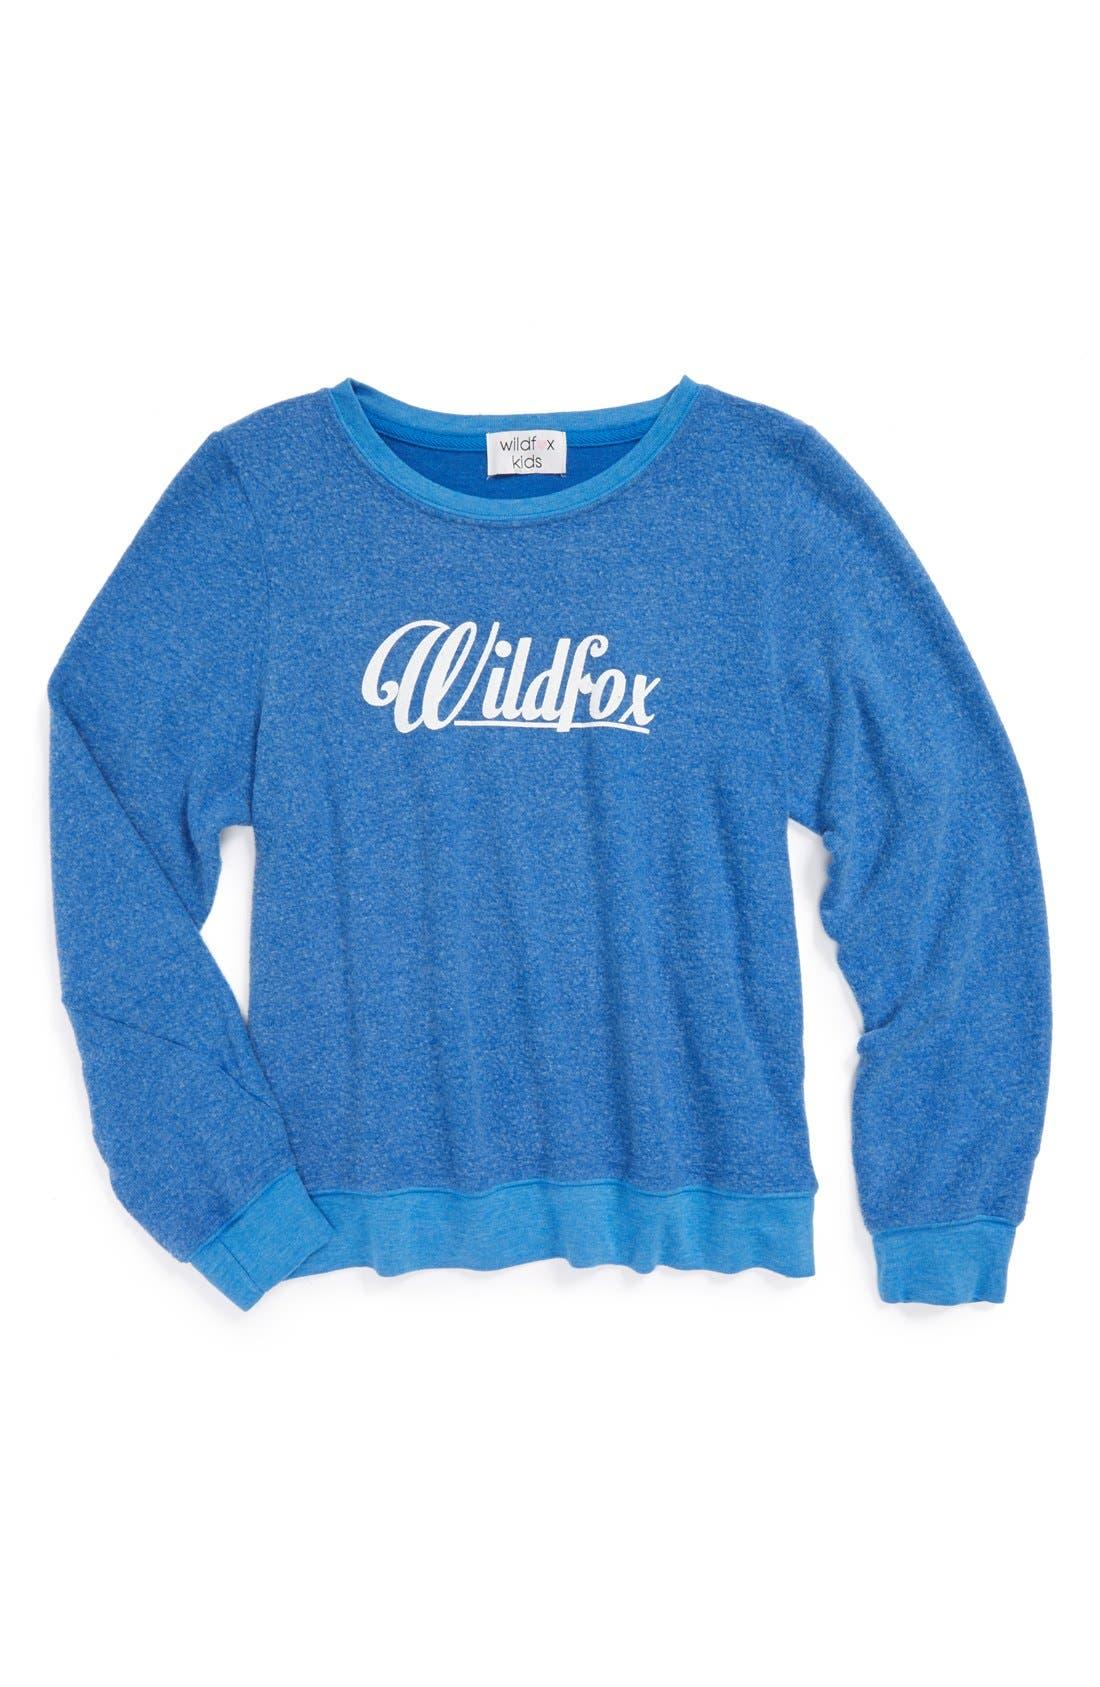 Alternate Image 1 Selected - Wildfox '60's' Lightweight Sweatshirt (Big Girls)